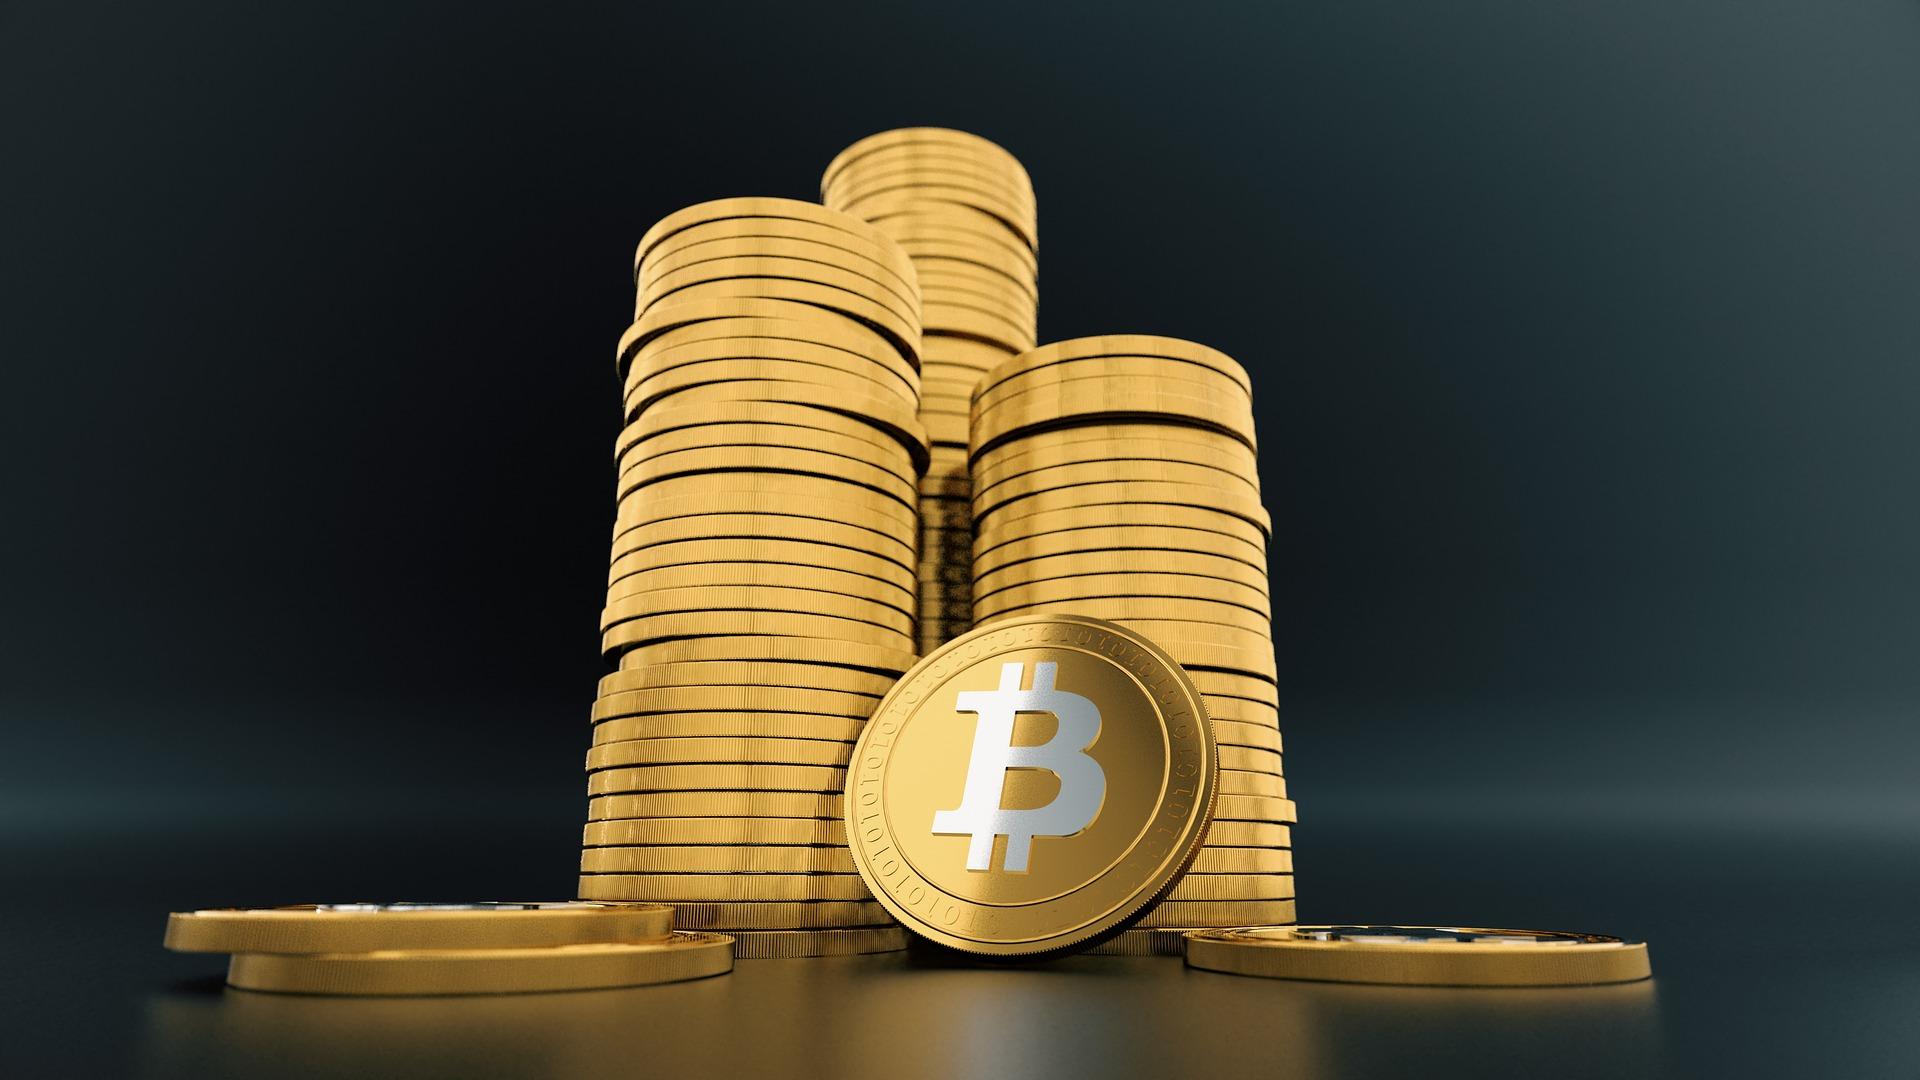 strategia breve bitcoin etf btc mercati aumentano limite